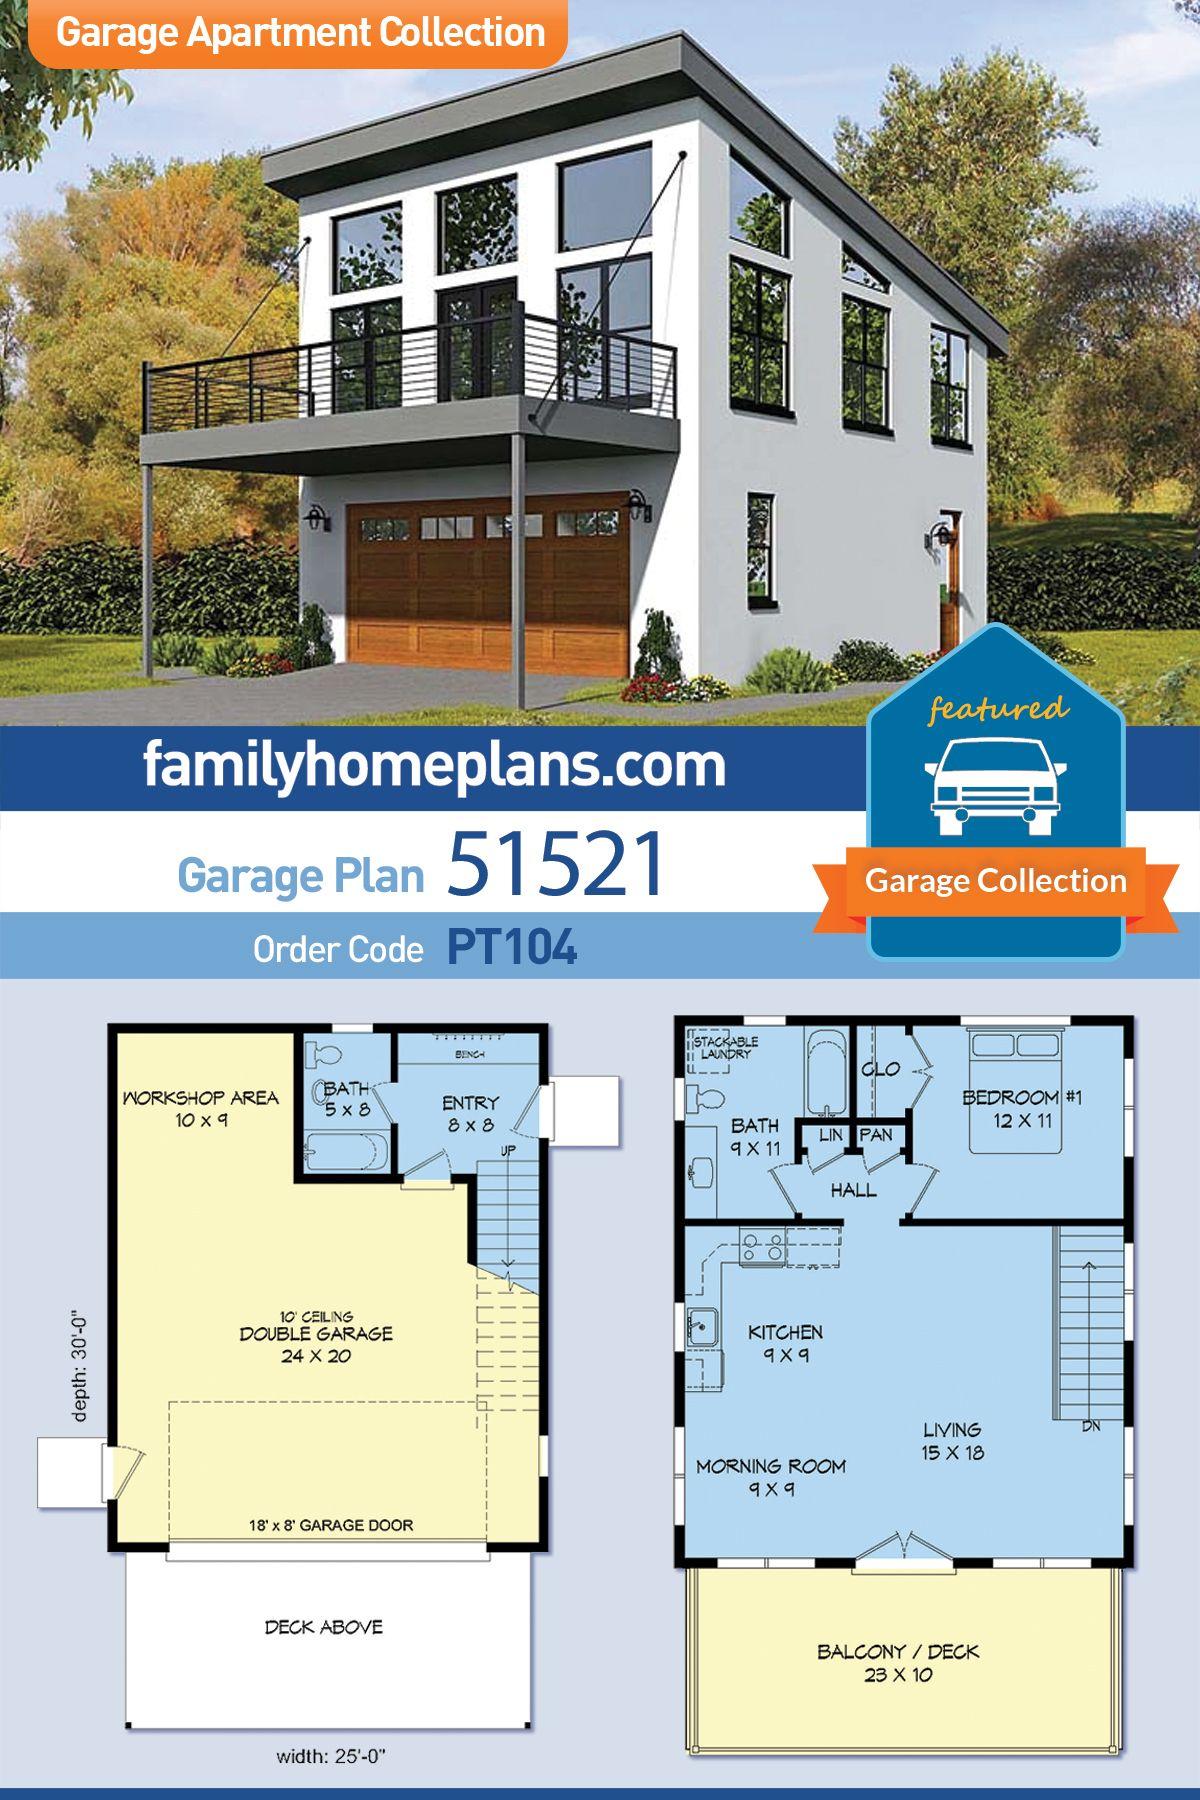 Modern Style Garage Living Plan 51521 With 1 Bed 2 Bath 2 Car Garage Carriage House Plans Garage Plans With Loft Garage Apartment Plan